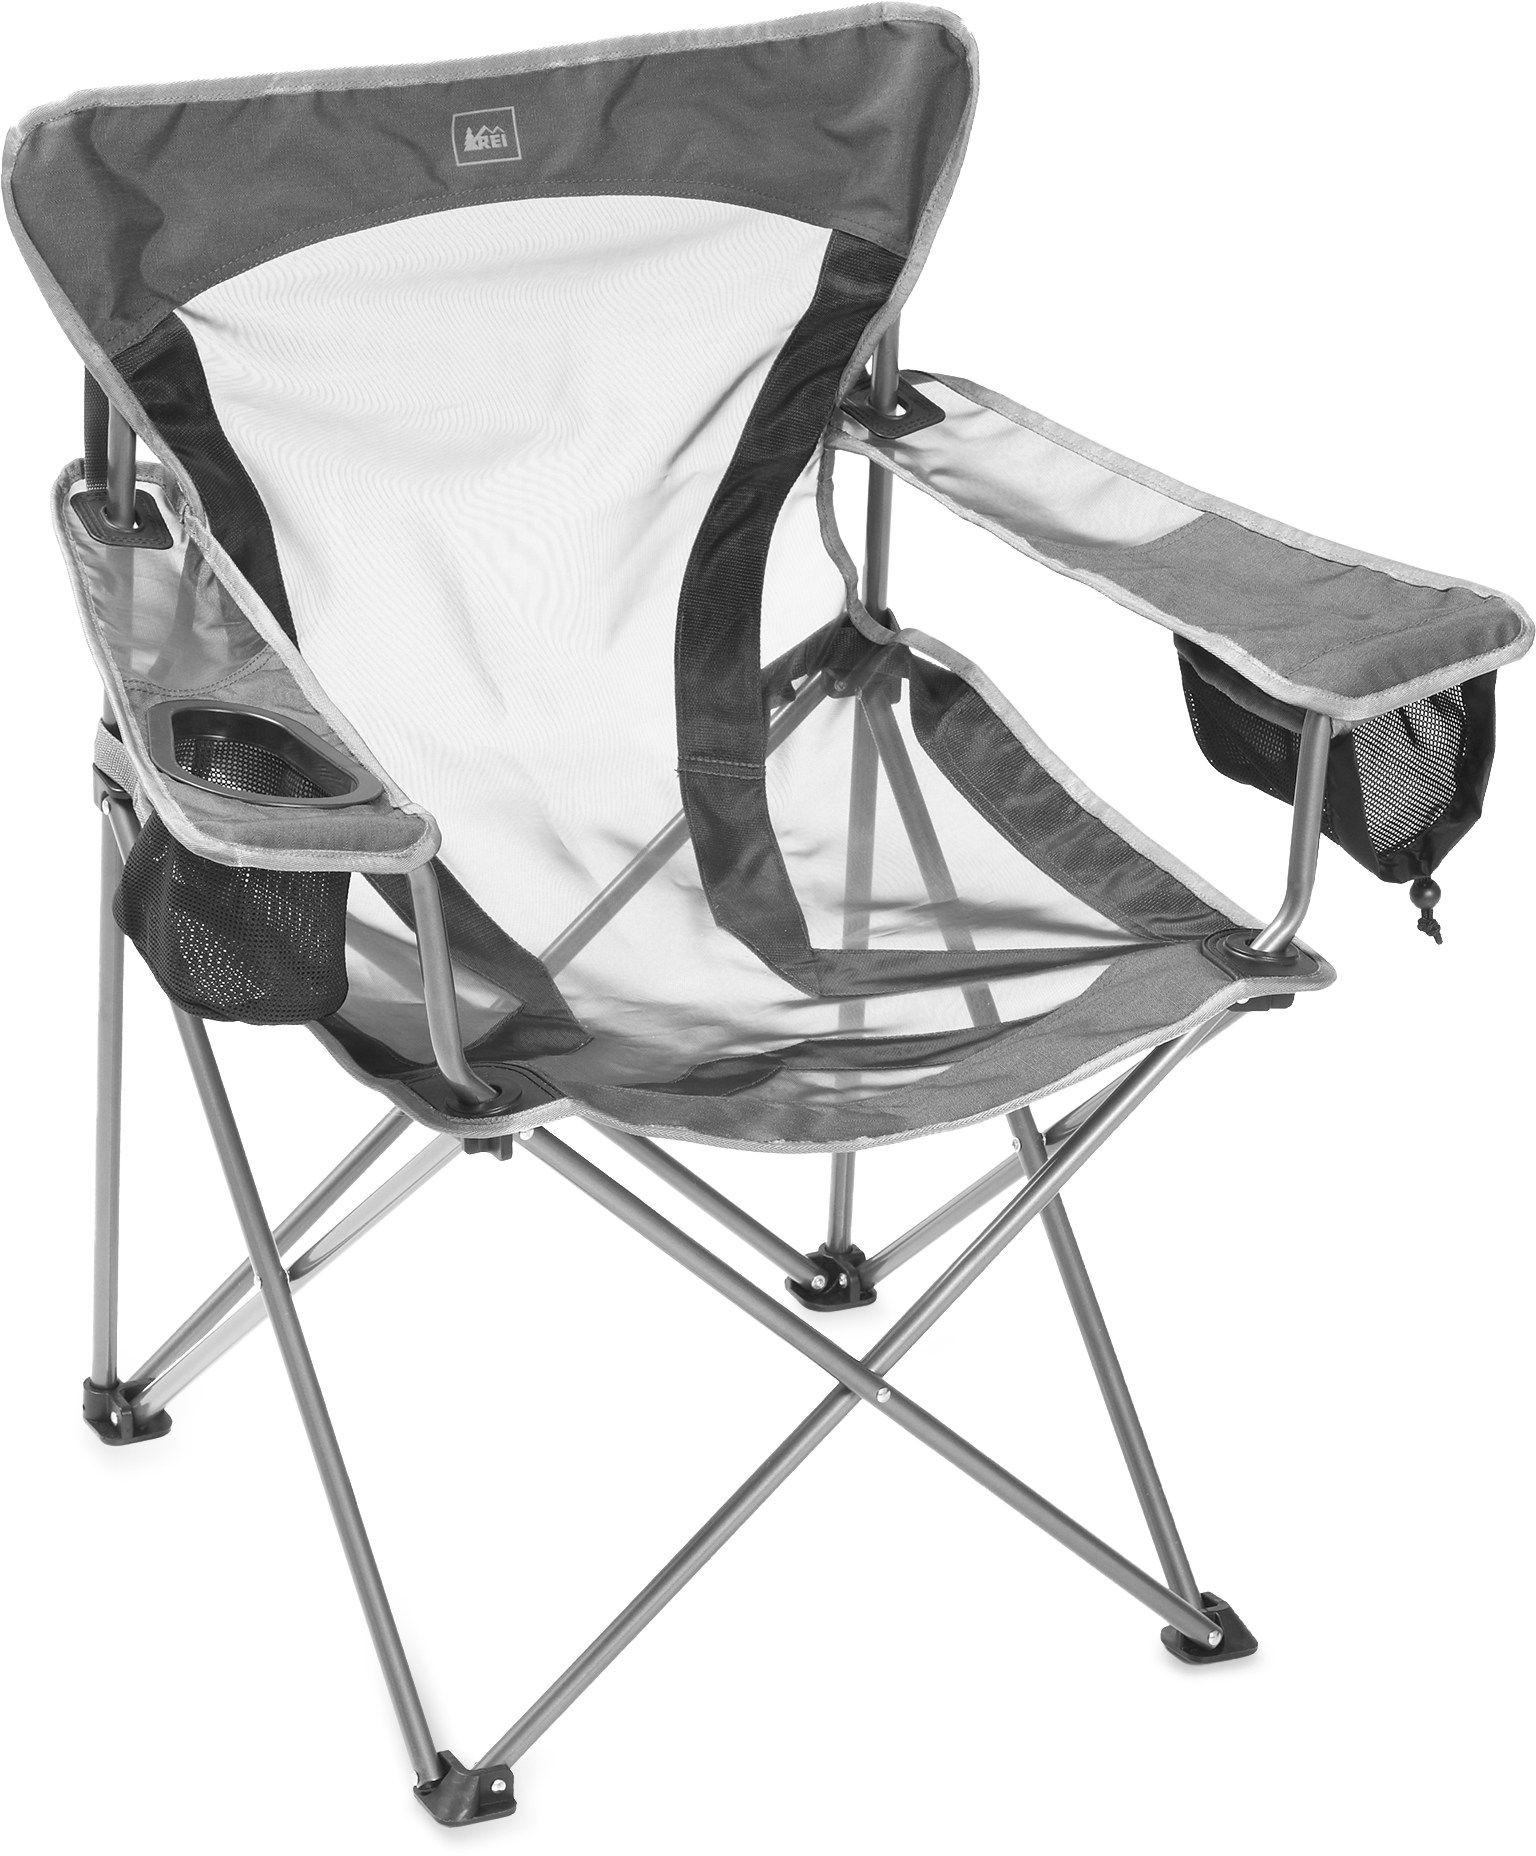 REI Camp X Chair REI Camp Holmes Pinterest Camping